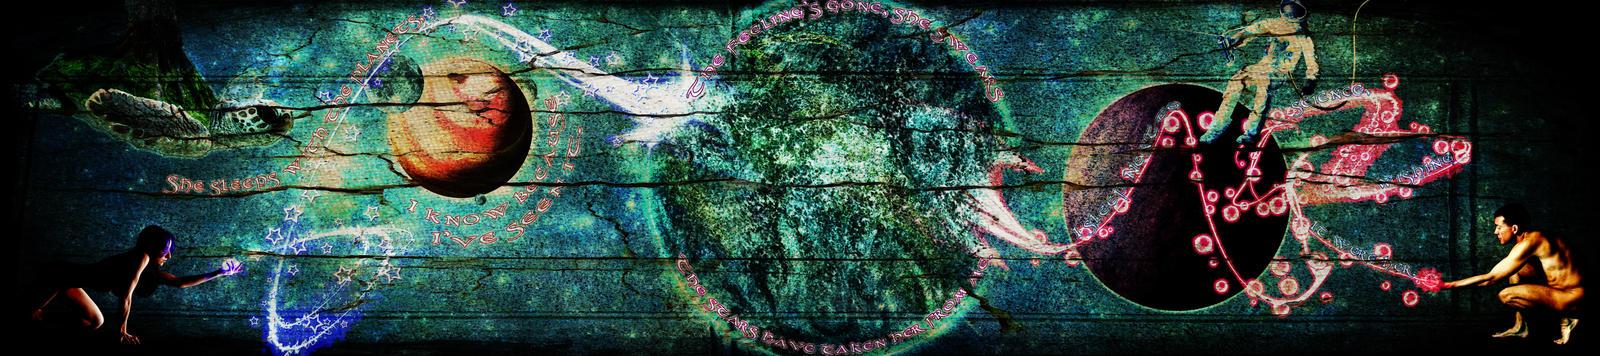 Eclipsical by l3pr0sy